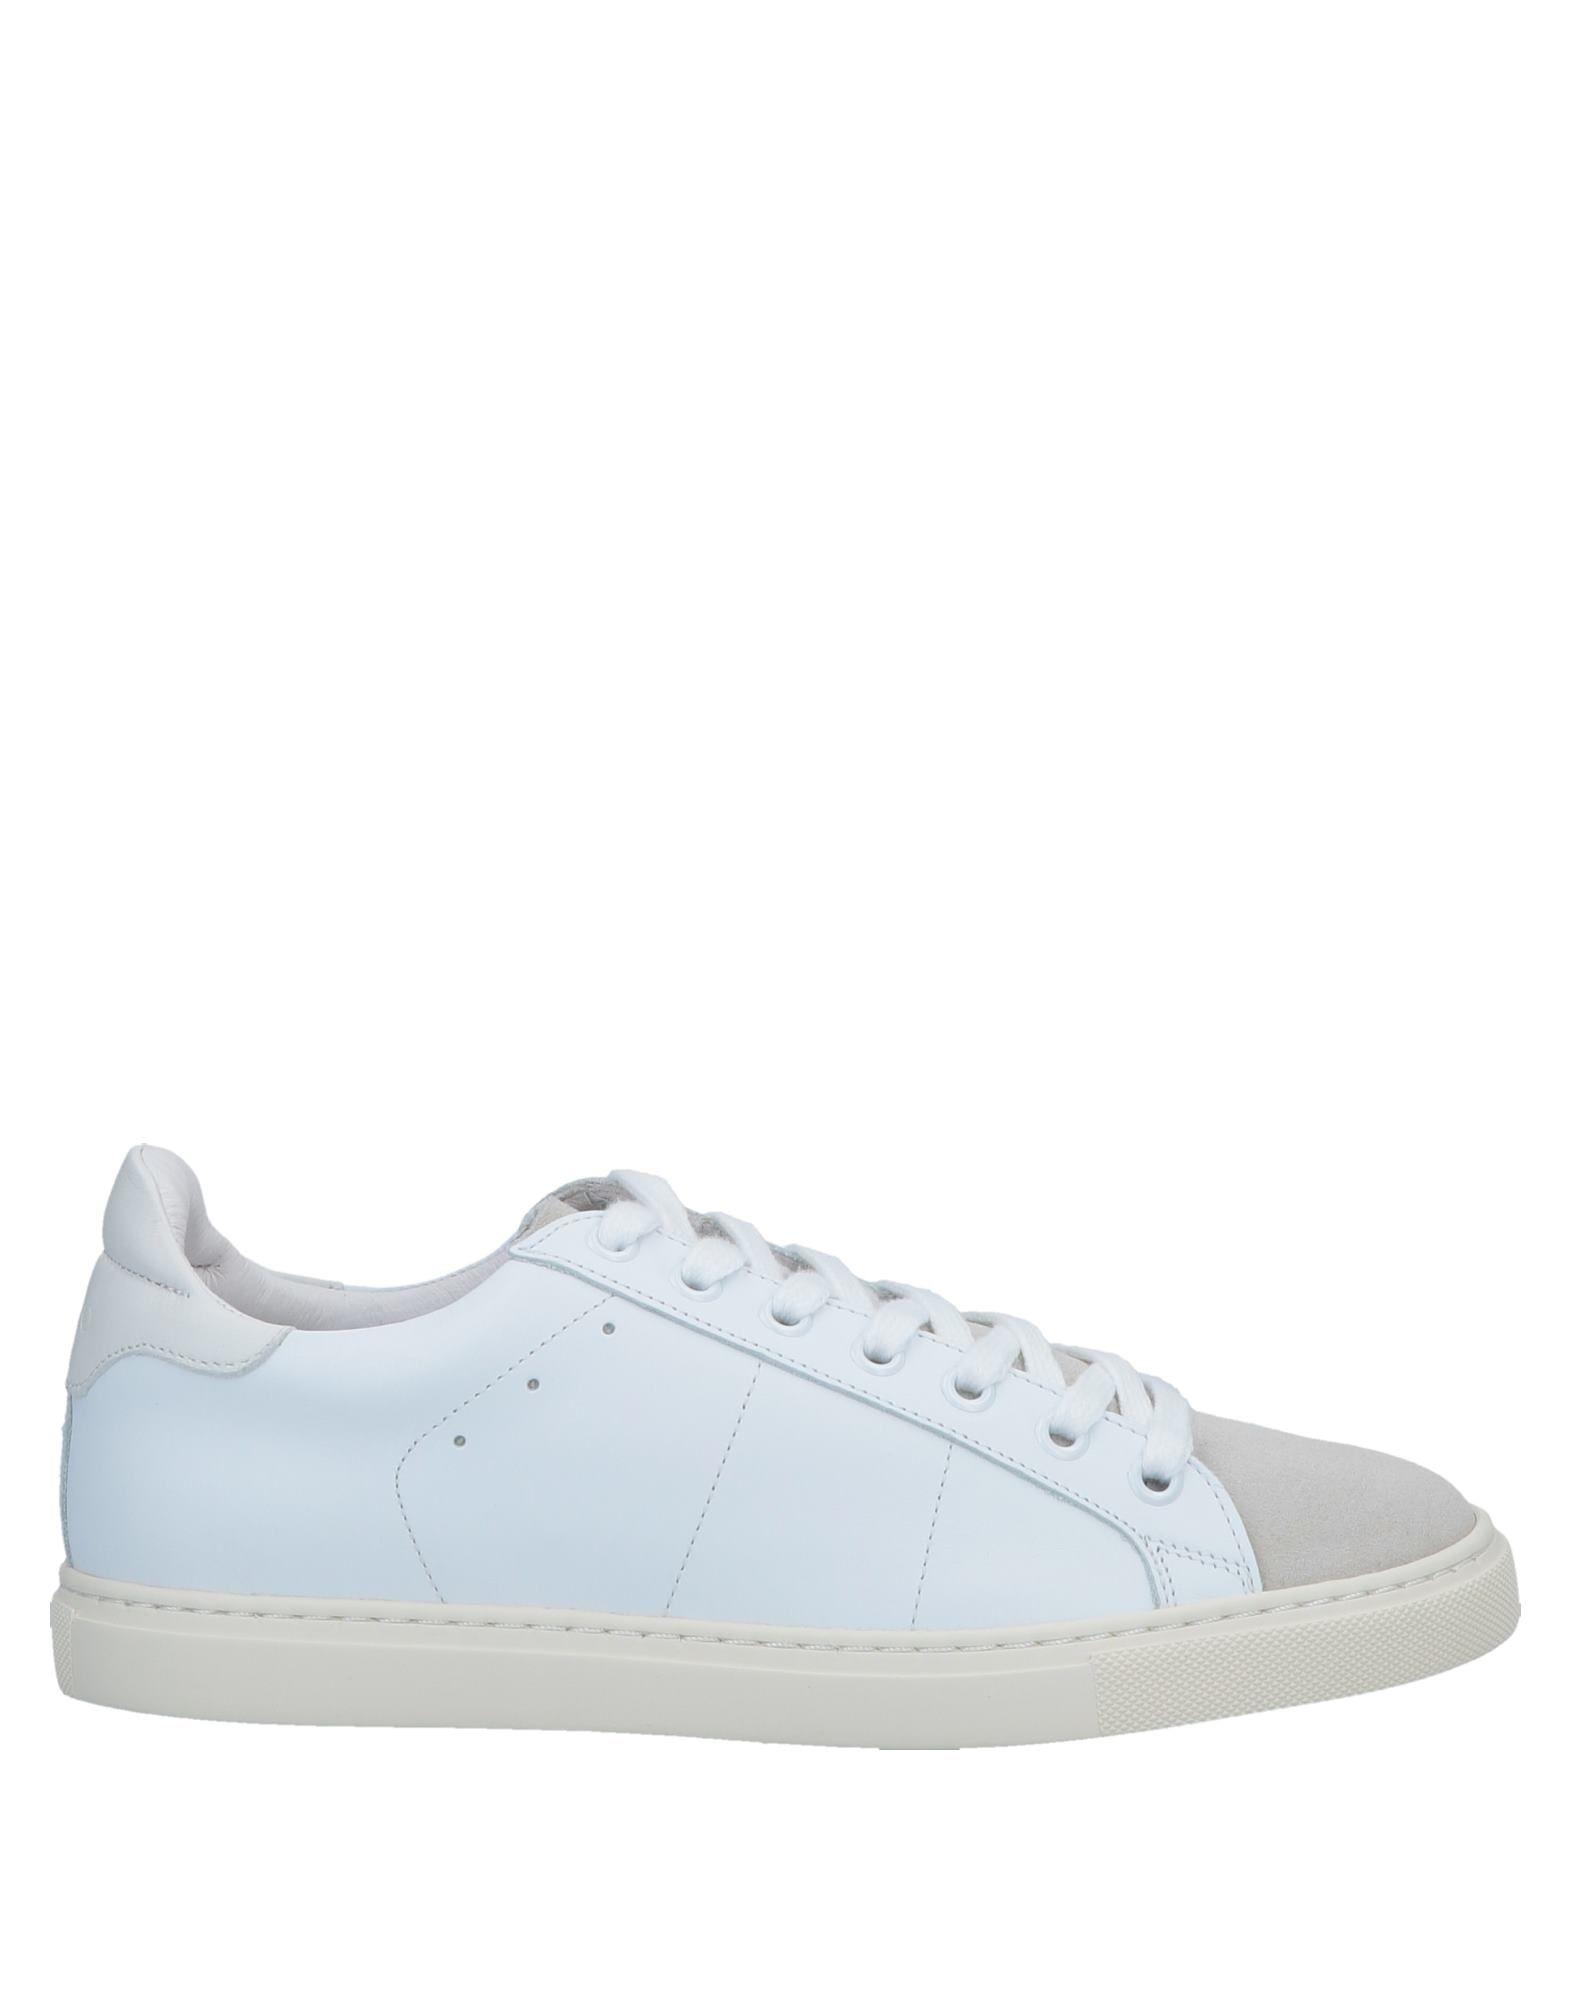 Lyst - IRO Low-tops   Sneakers in Gray ec2df03f5